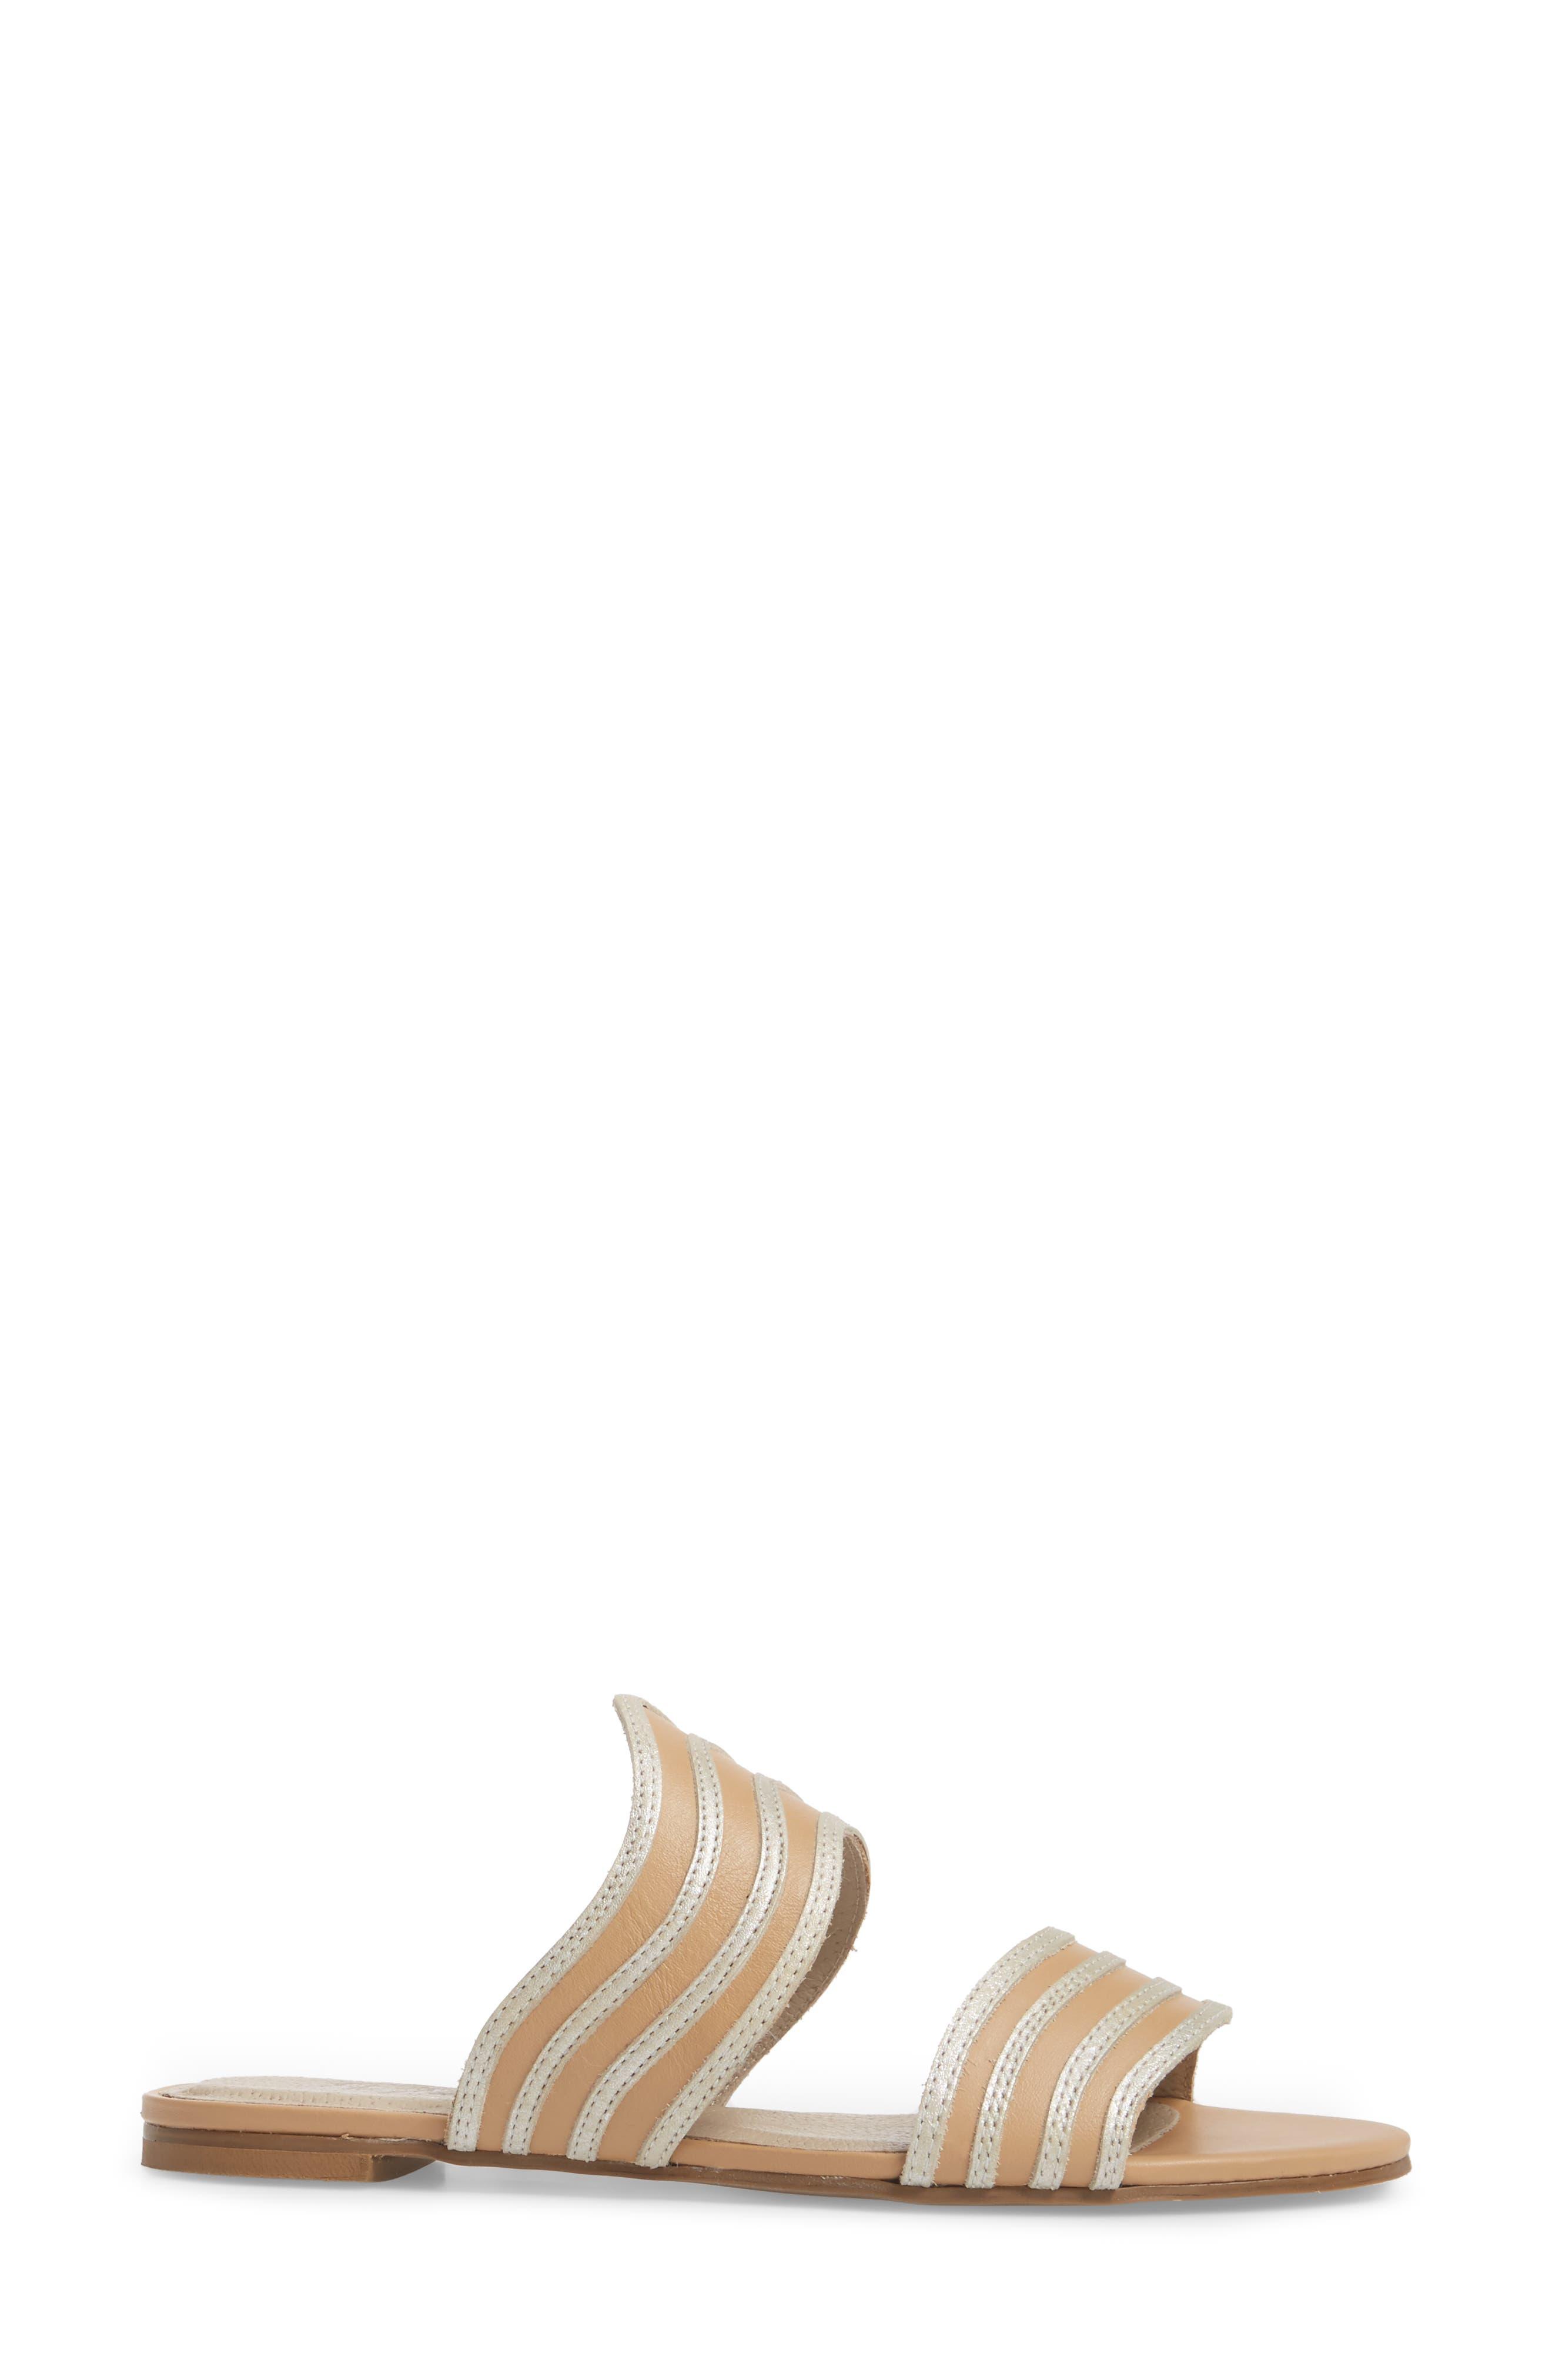 Russo Slide Sandal,                             Alternate thumbnail 3, color,                             Natural/ Silver Leather